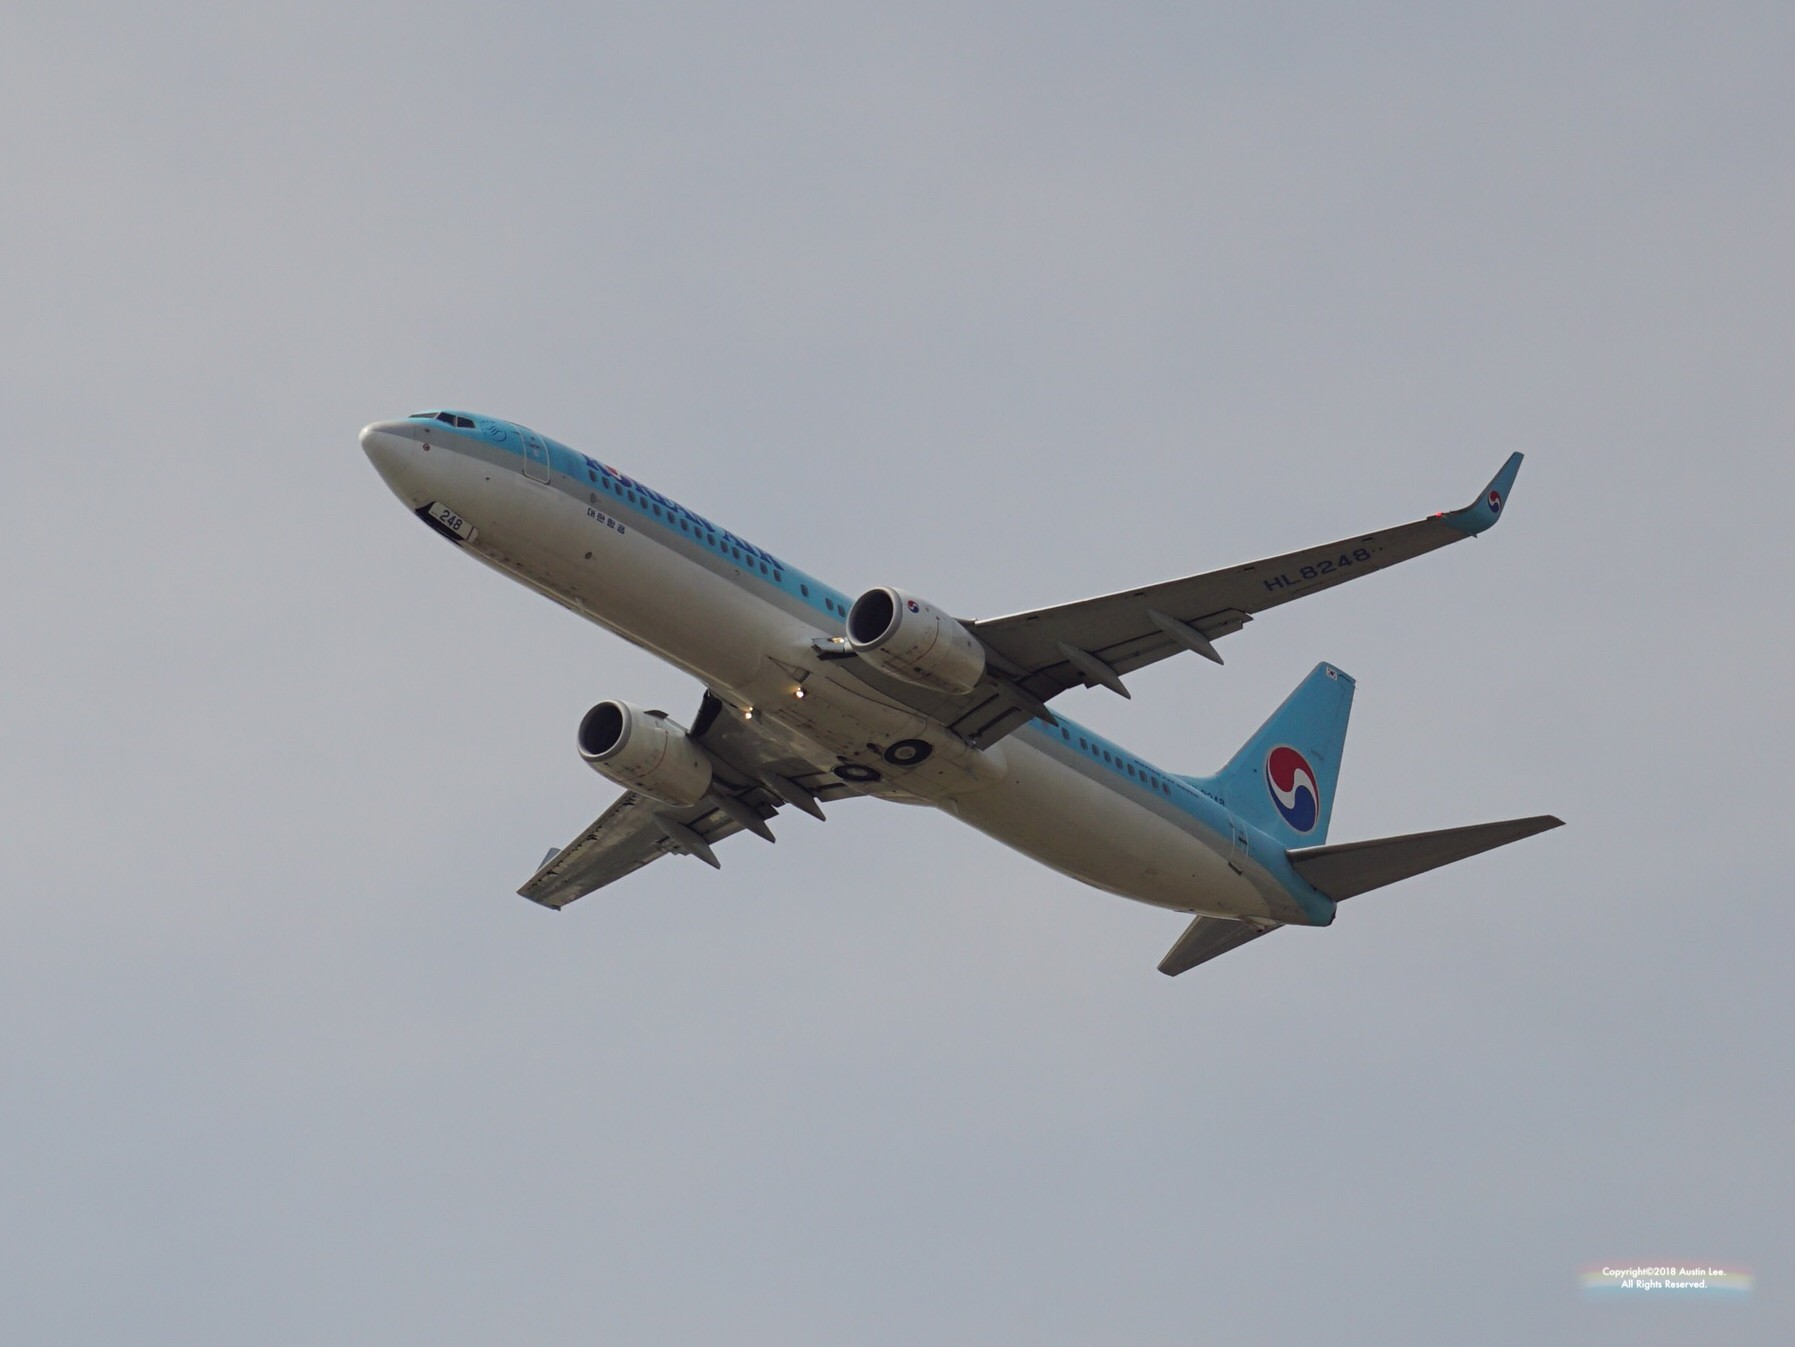 Re:[原创]【XMN】【多图】来接max~首次在厦门和死党们拍机~May.26th记 BOEING 737-9B5(ER) HL8248 中国厦门高崎国际机场